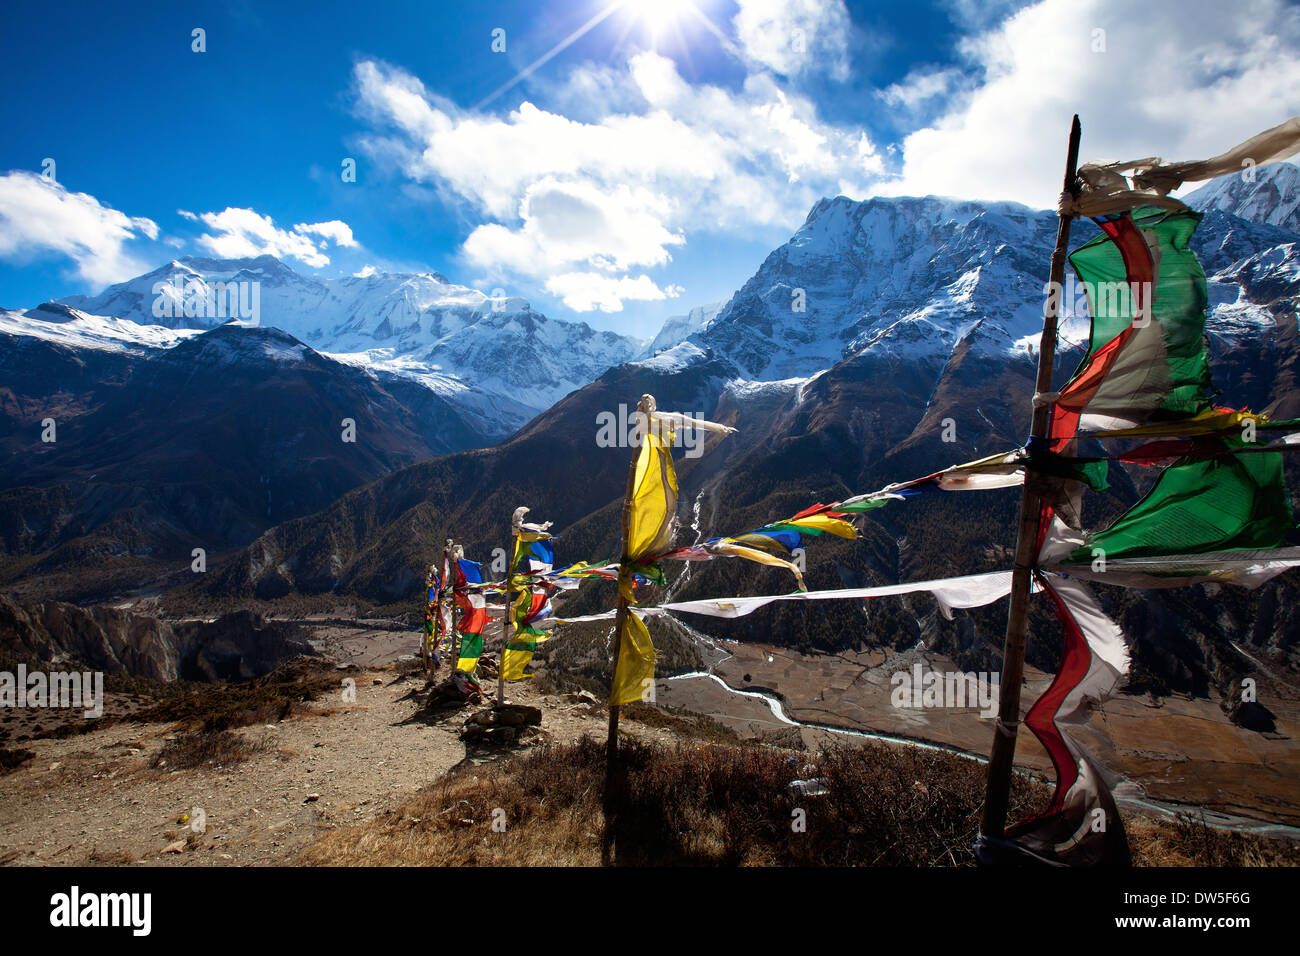 Himalaya mountains, Nepal - Stock Image